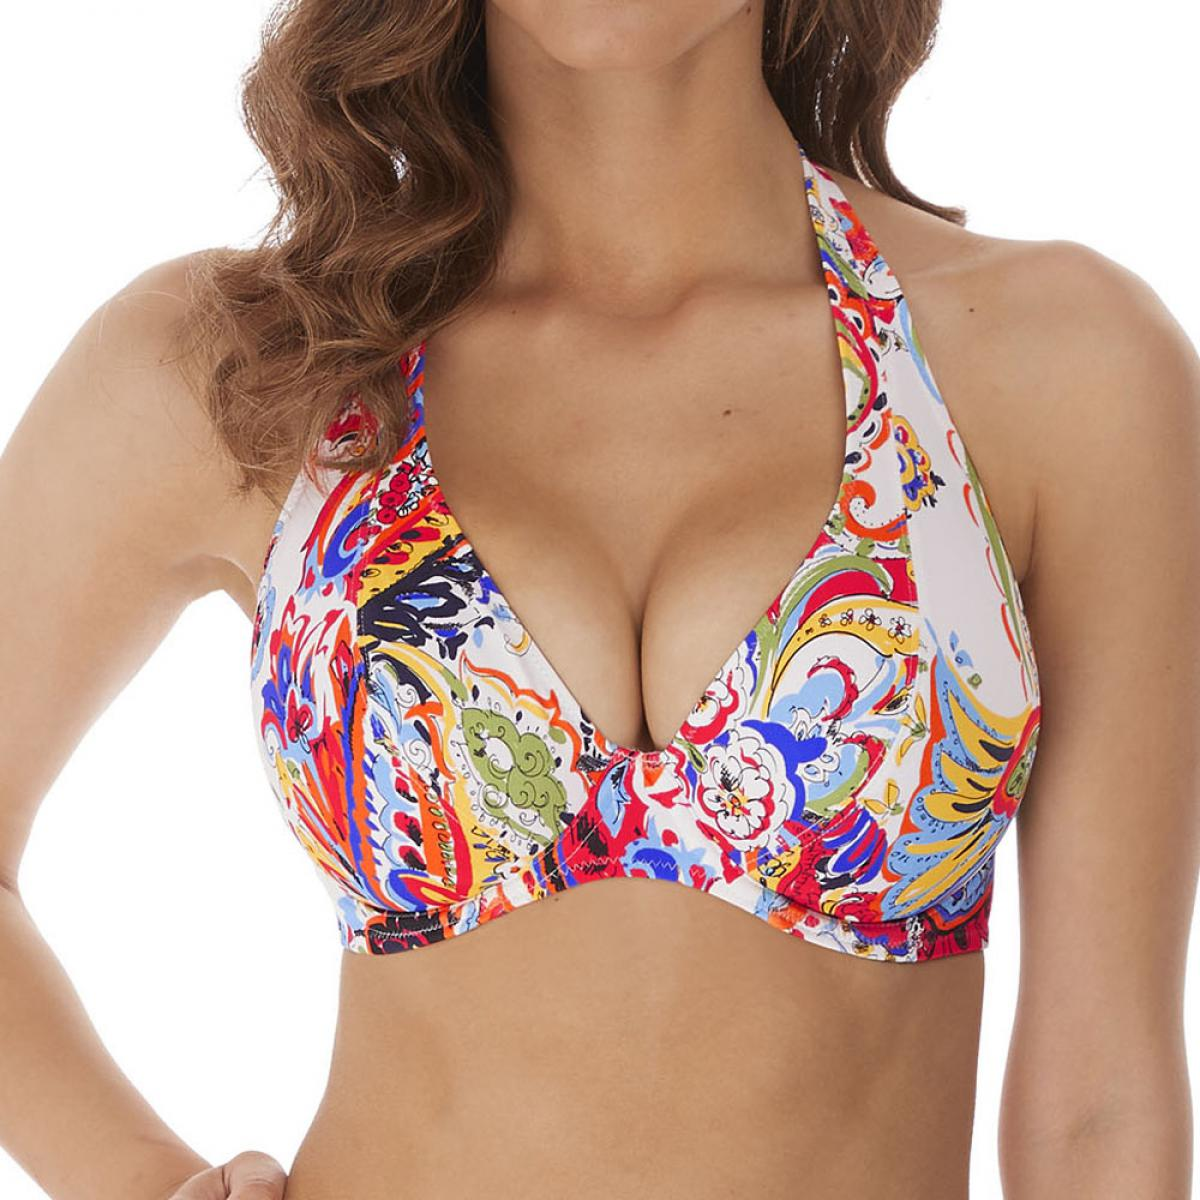 Promo : Haut de maillot de bain plongeant armatures multicolore - Freya maillot - Modalova